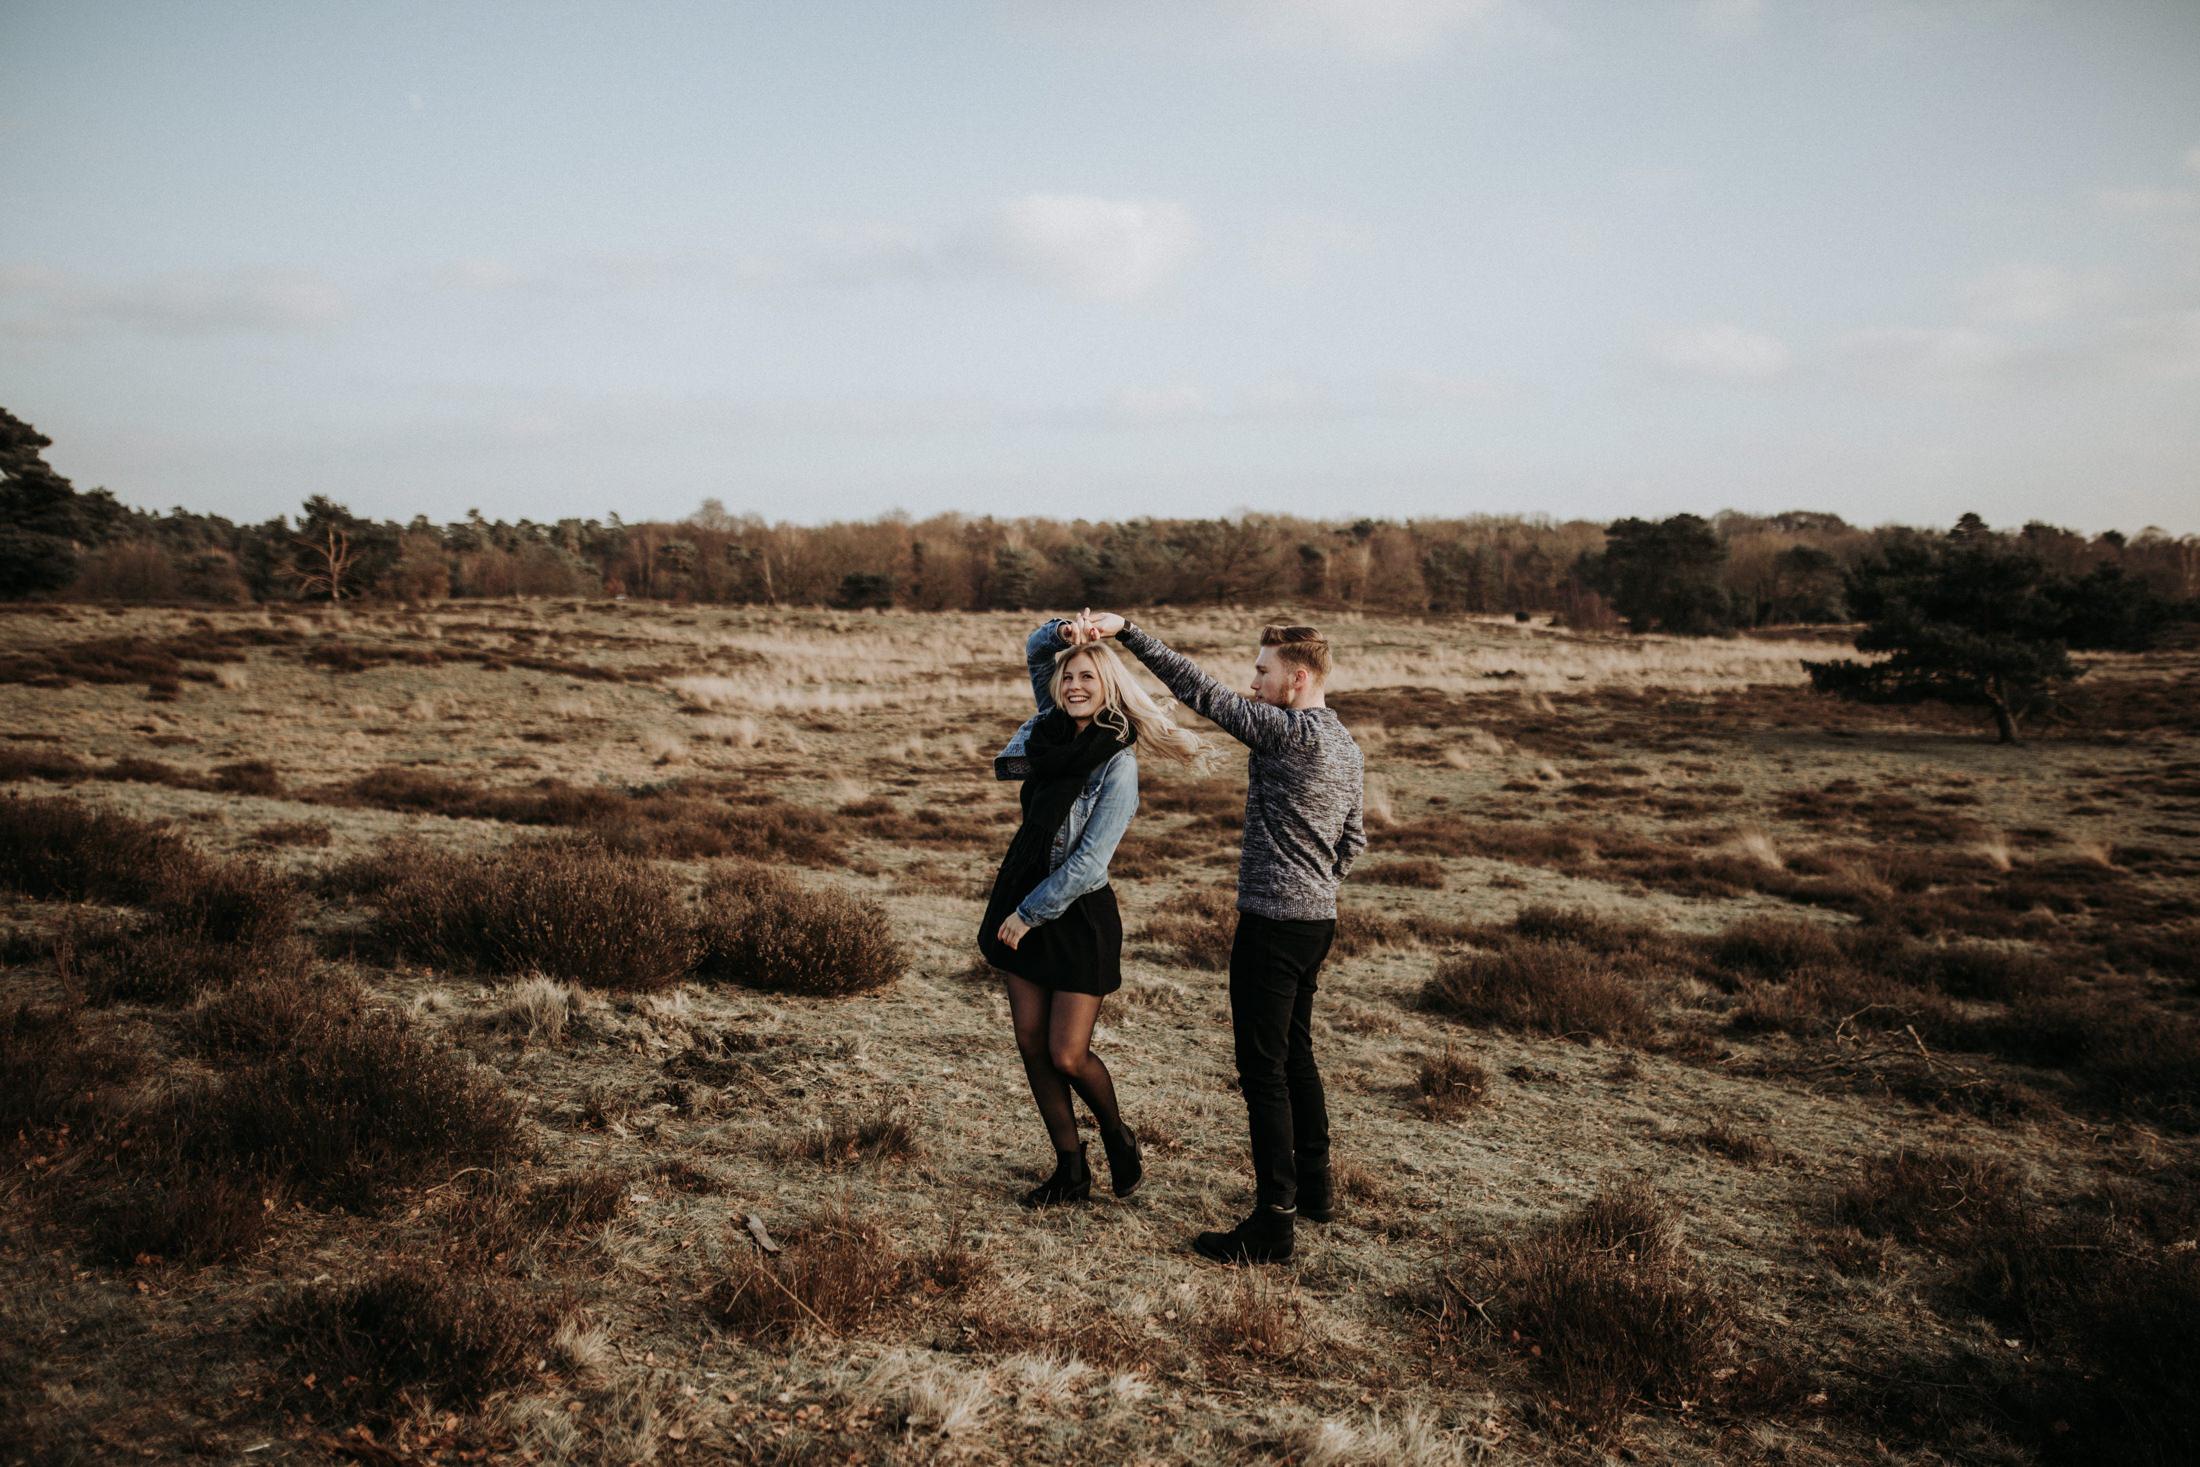 Wedding_Photographer_Mallorca_Daniela-Marquardt_Photography_CanaryIslands_Lanzarote_Iceland_Tuskany_Santorini_Portugal__Austria_Elopement_Hochzeitsfotograf_Milena_Marvin_10